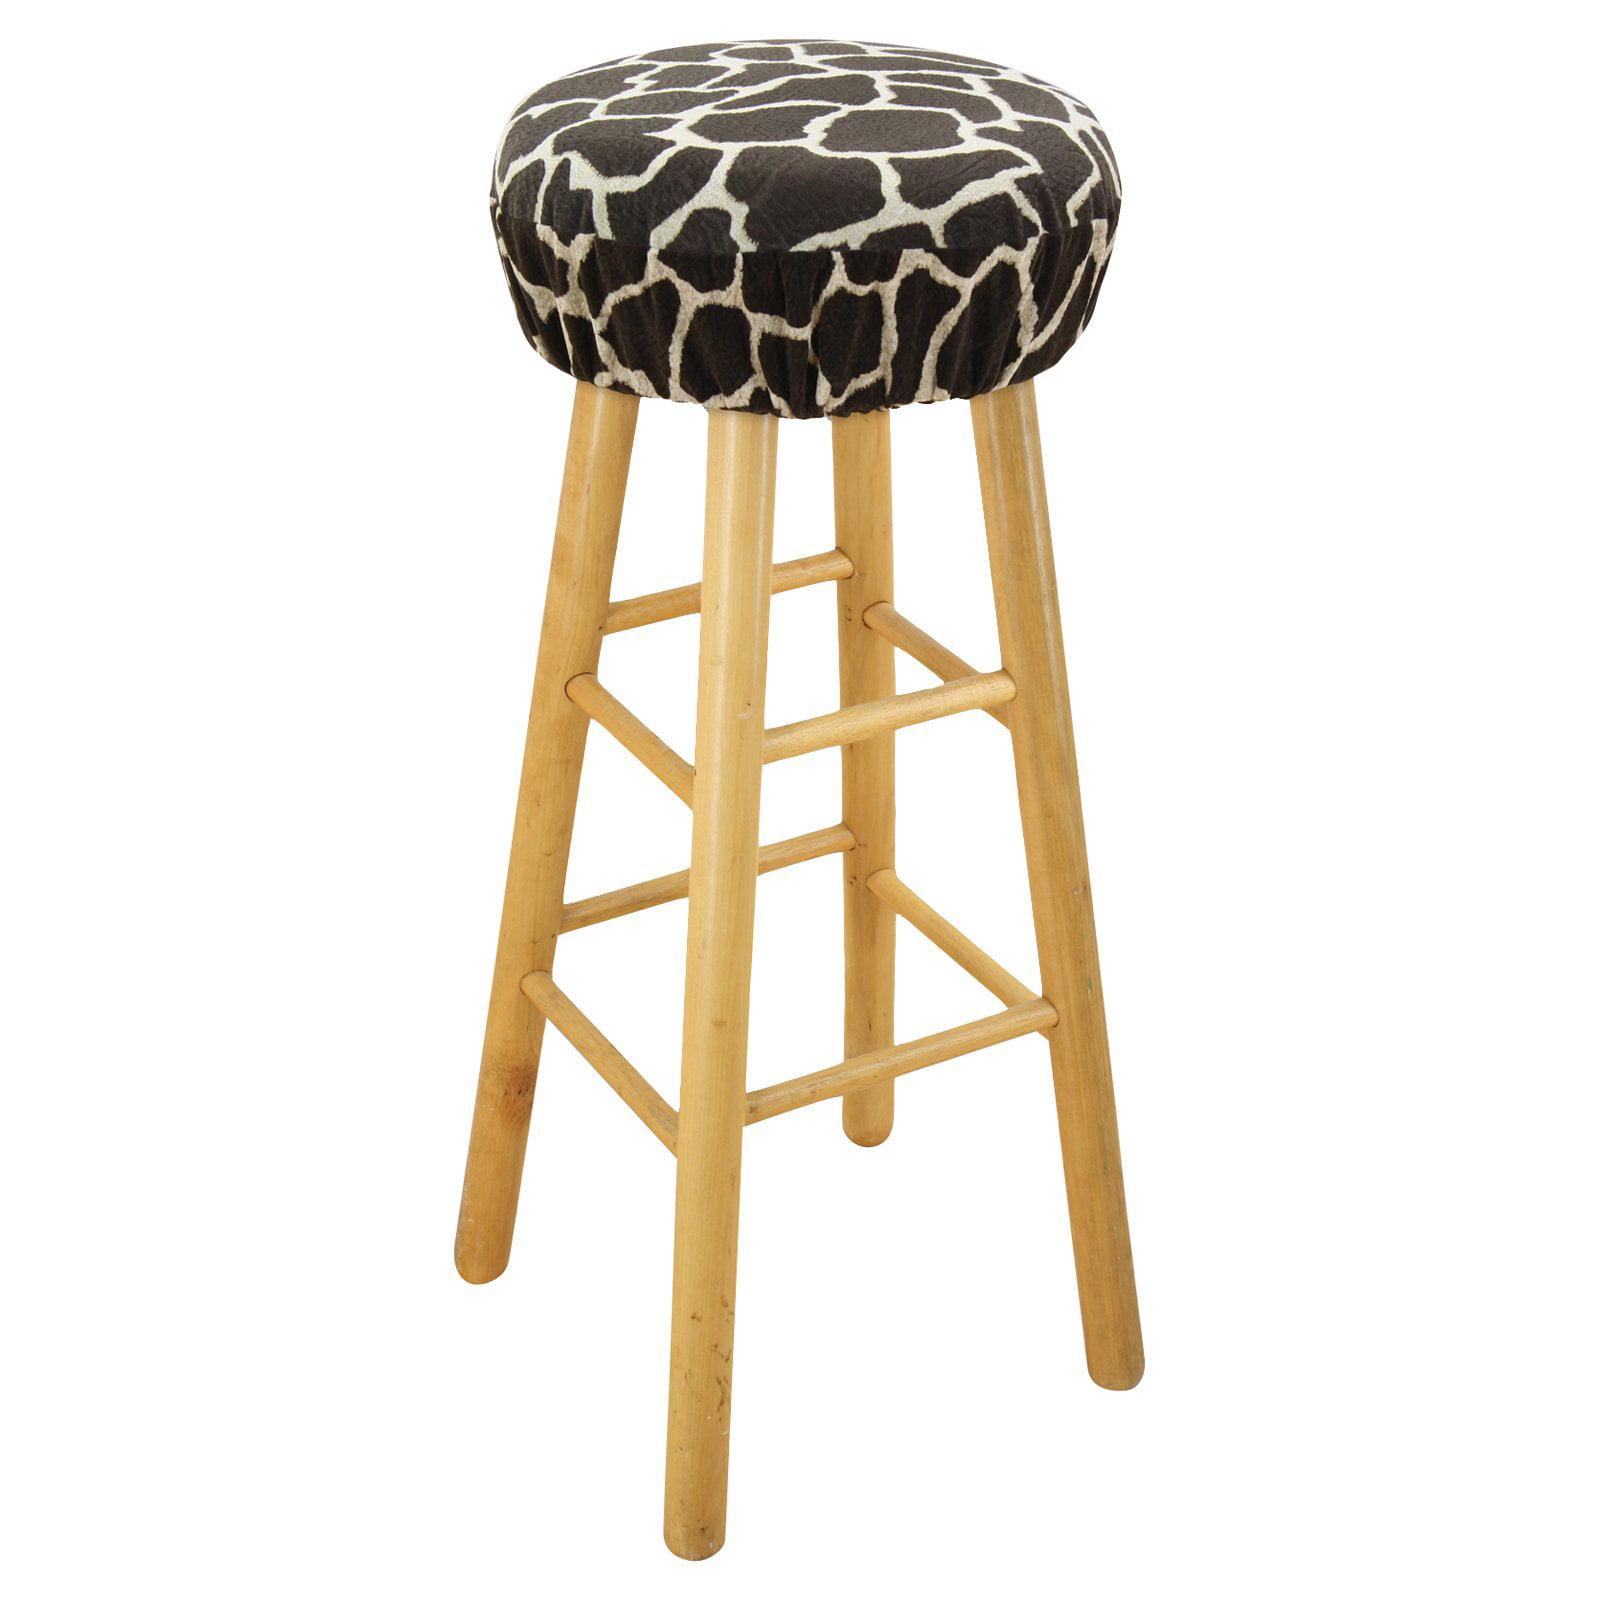 Brite Ideas Living Giraffe Simply Soft 16 in. Round Foam Bar Stool Cushion